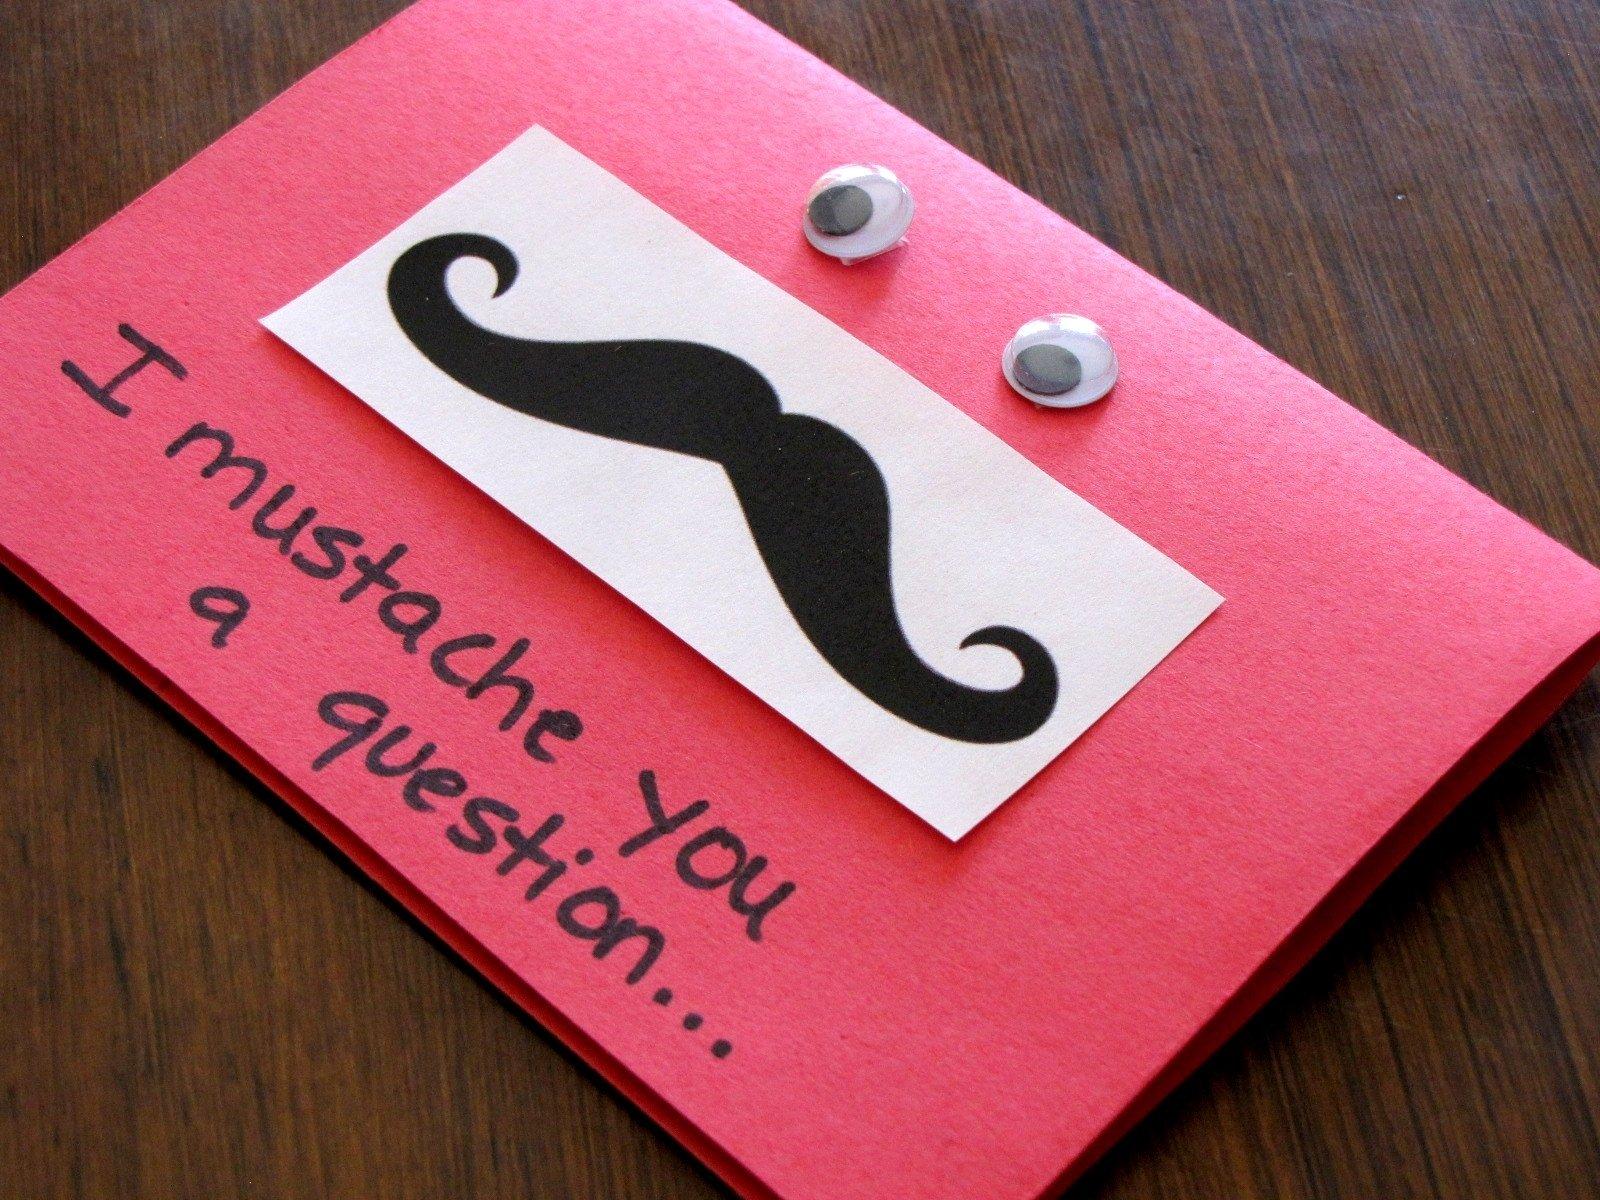 10 Best Homemade Valentines Day Card Ideas homemade valentines day cards quotes wishes for valentines week 2020